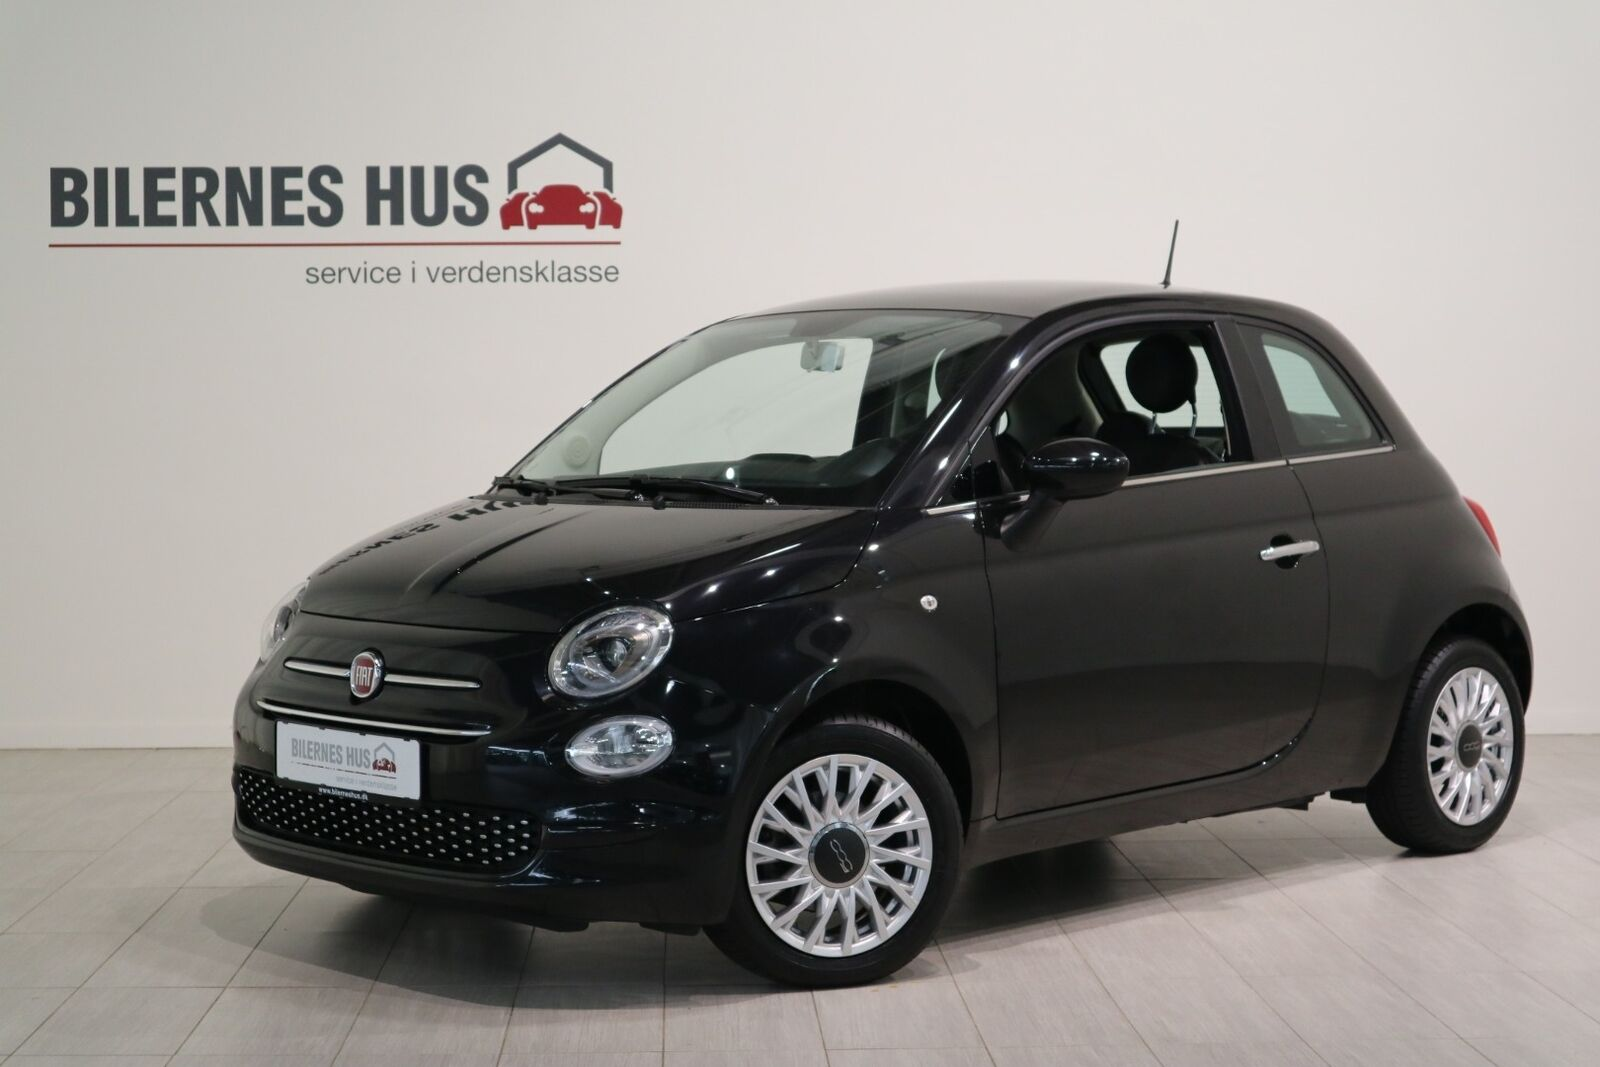 Fiat 500 Billede 2